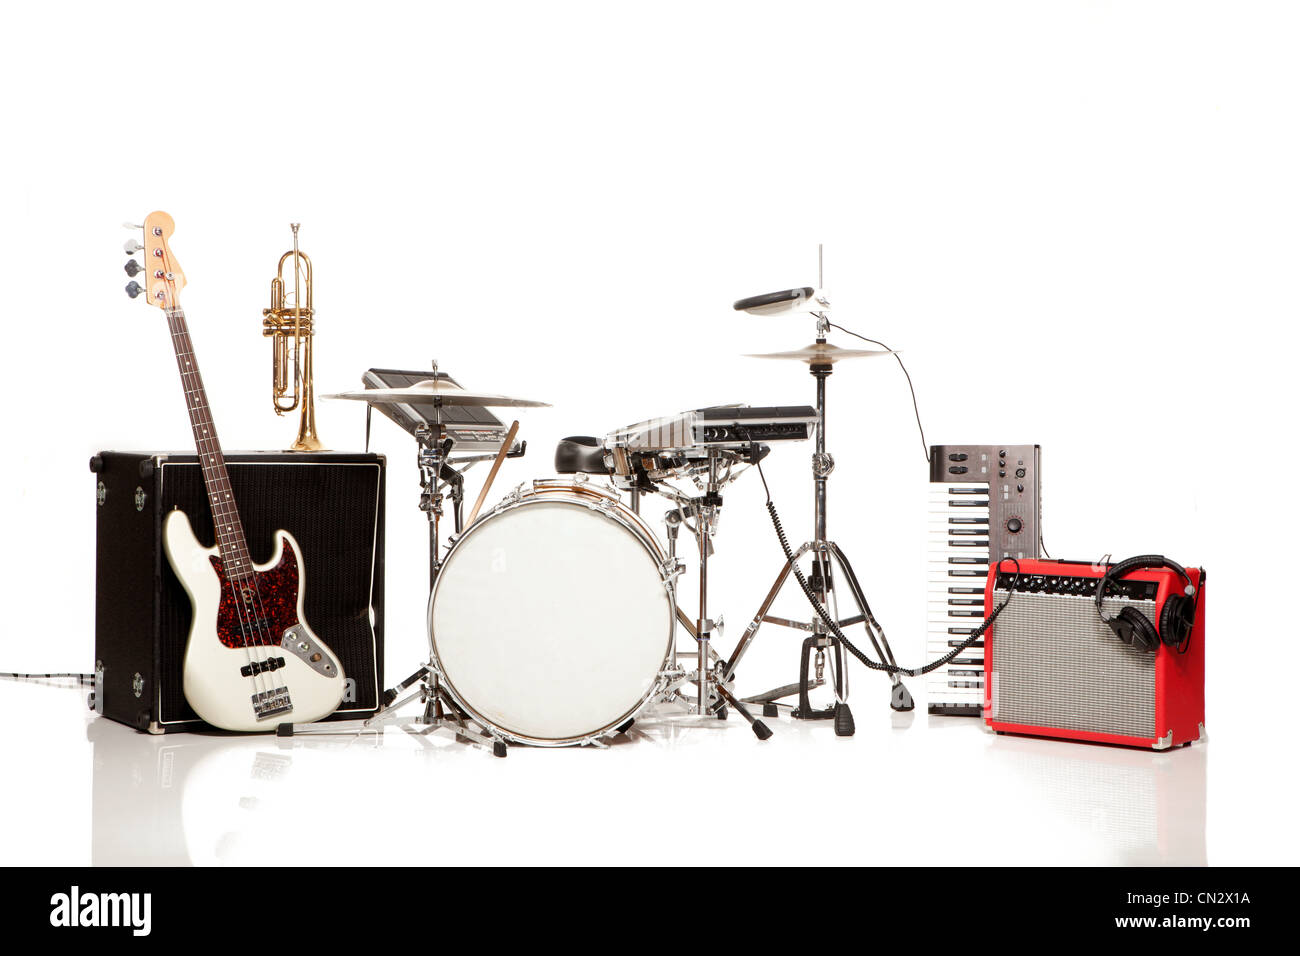 Kit de batterie, studio shot Photo Stock